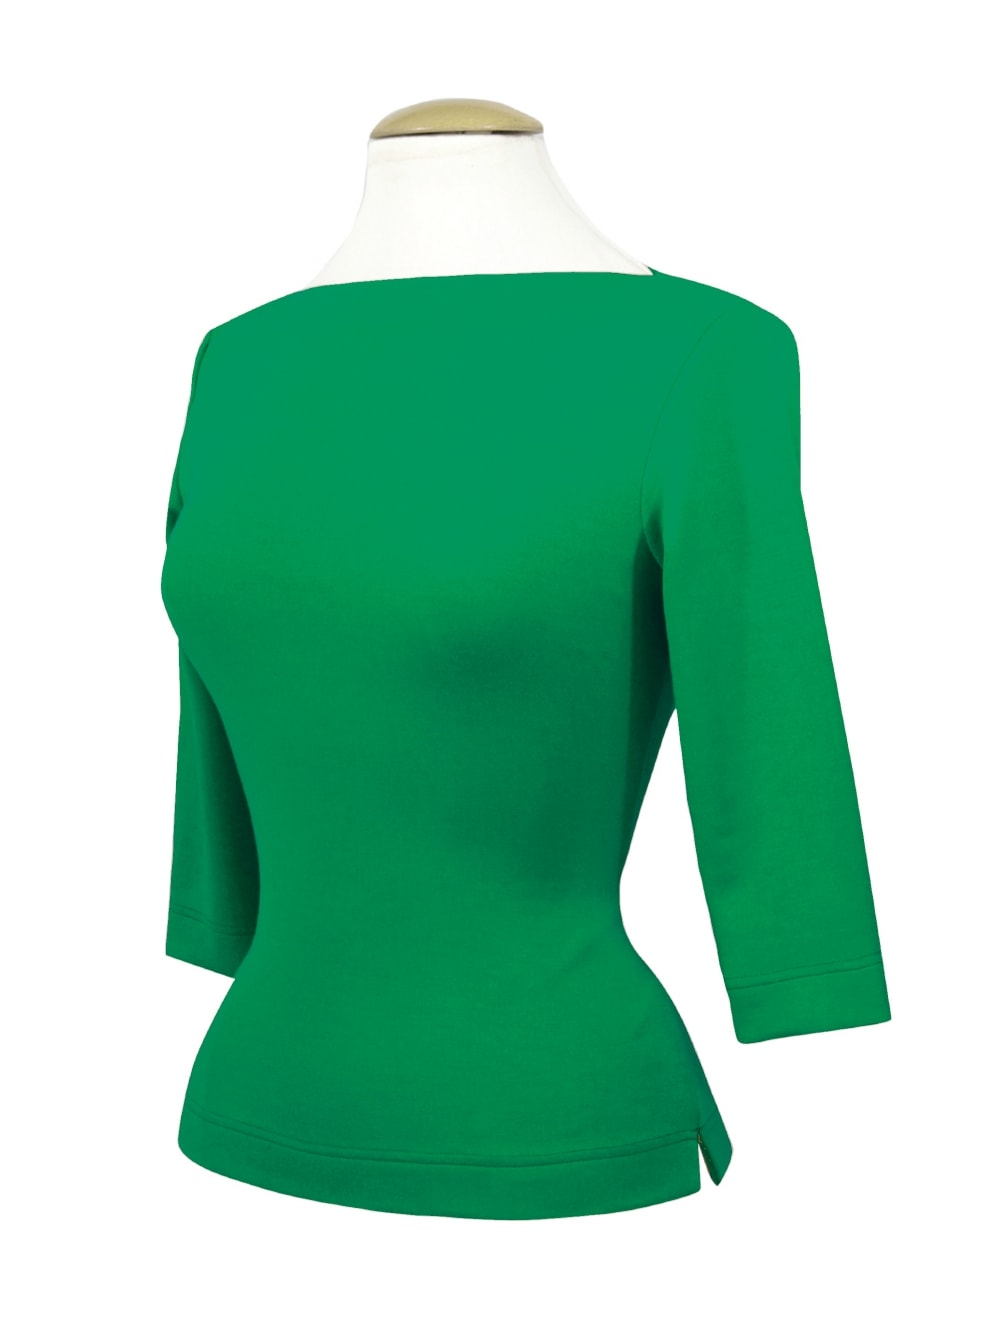 c985c38ab0359b Slash Neck Top Emerald Jersey from Vivien of Holloway